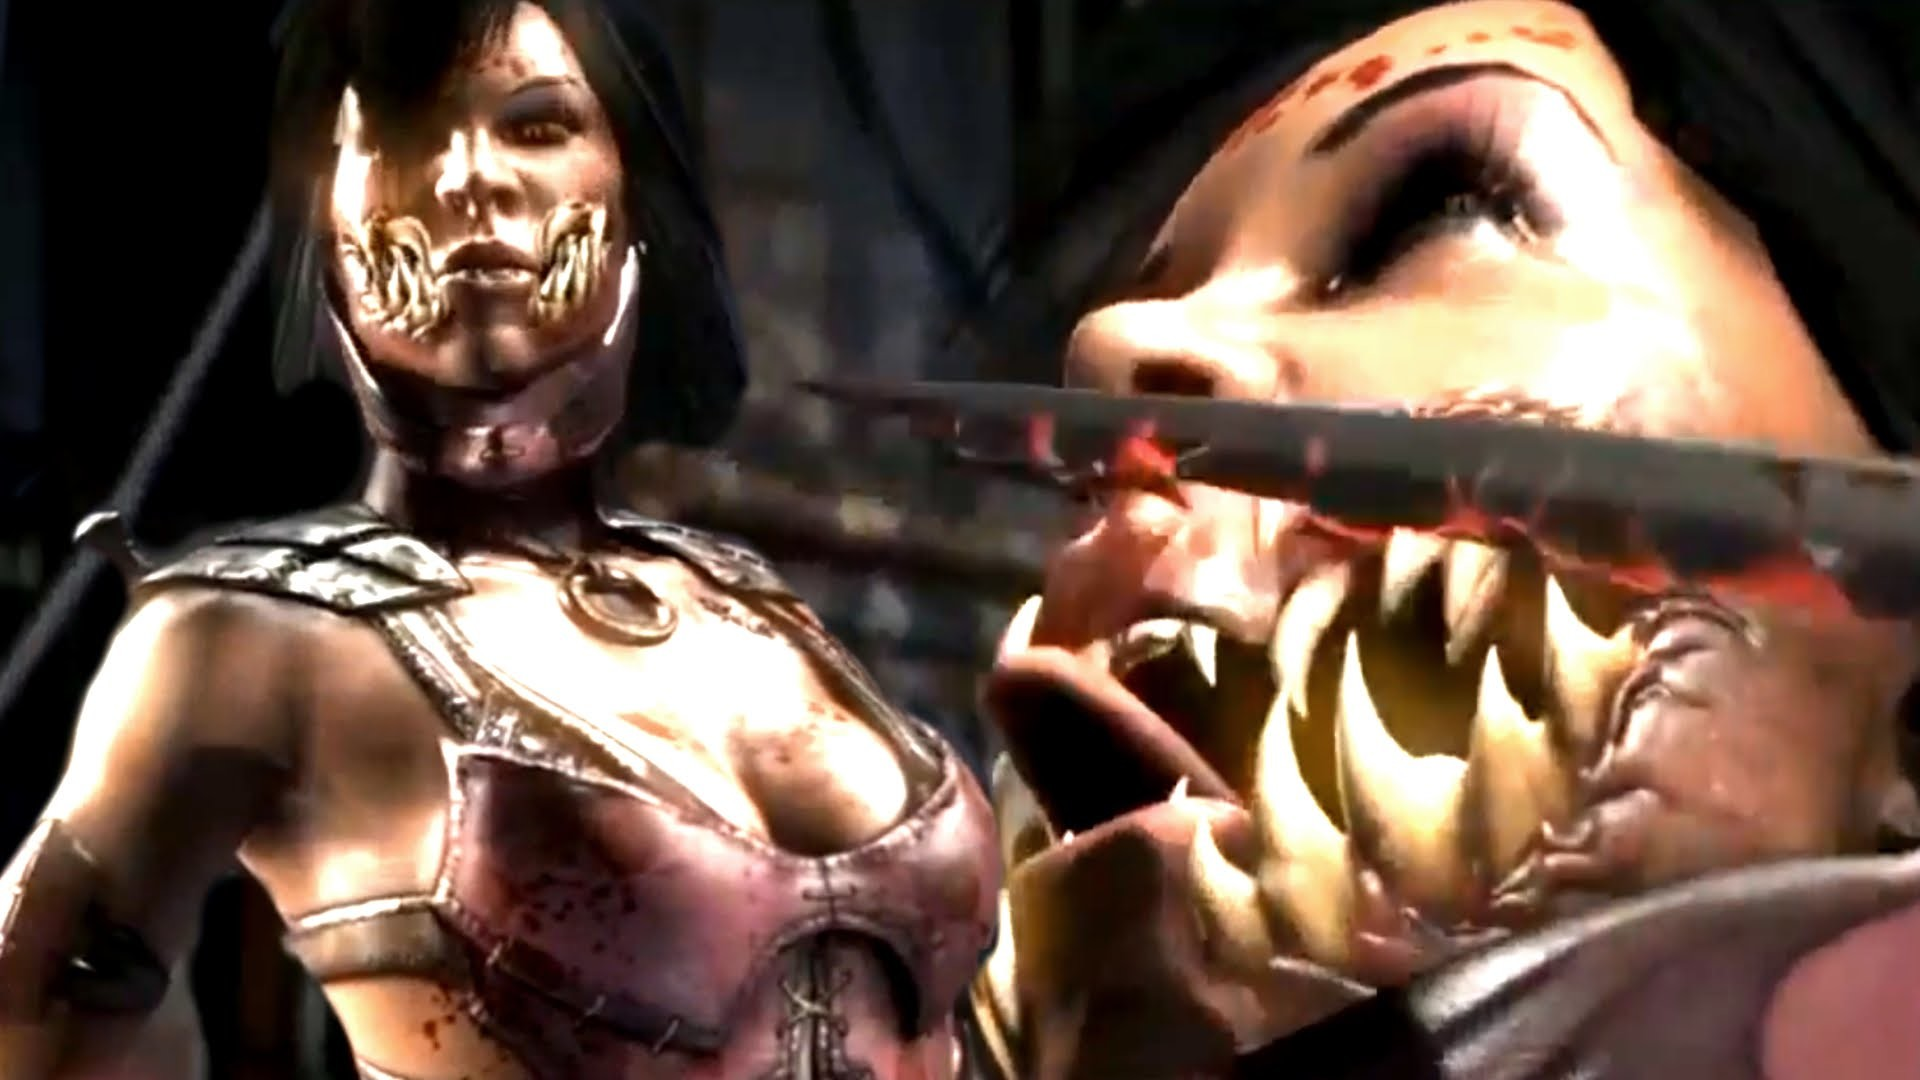 Mortal Kombat X – Mileena Fatality / X Ray Gameplay | Mortal Kombat 10 –  YouTube